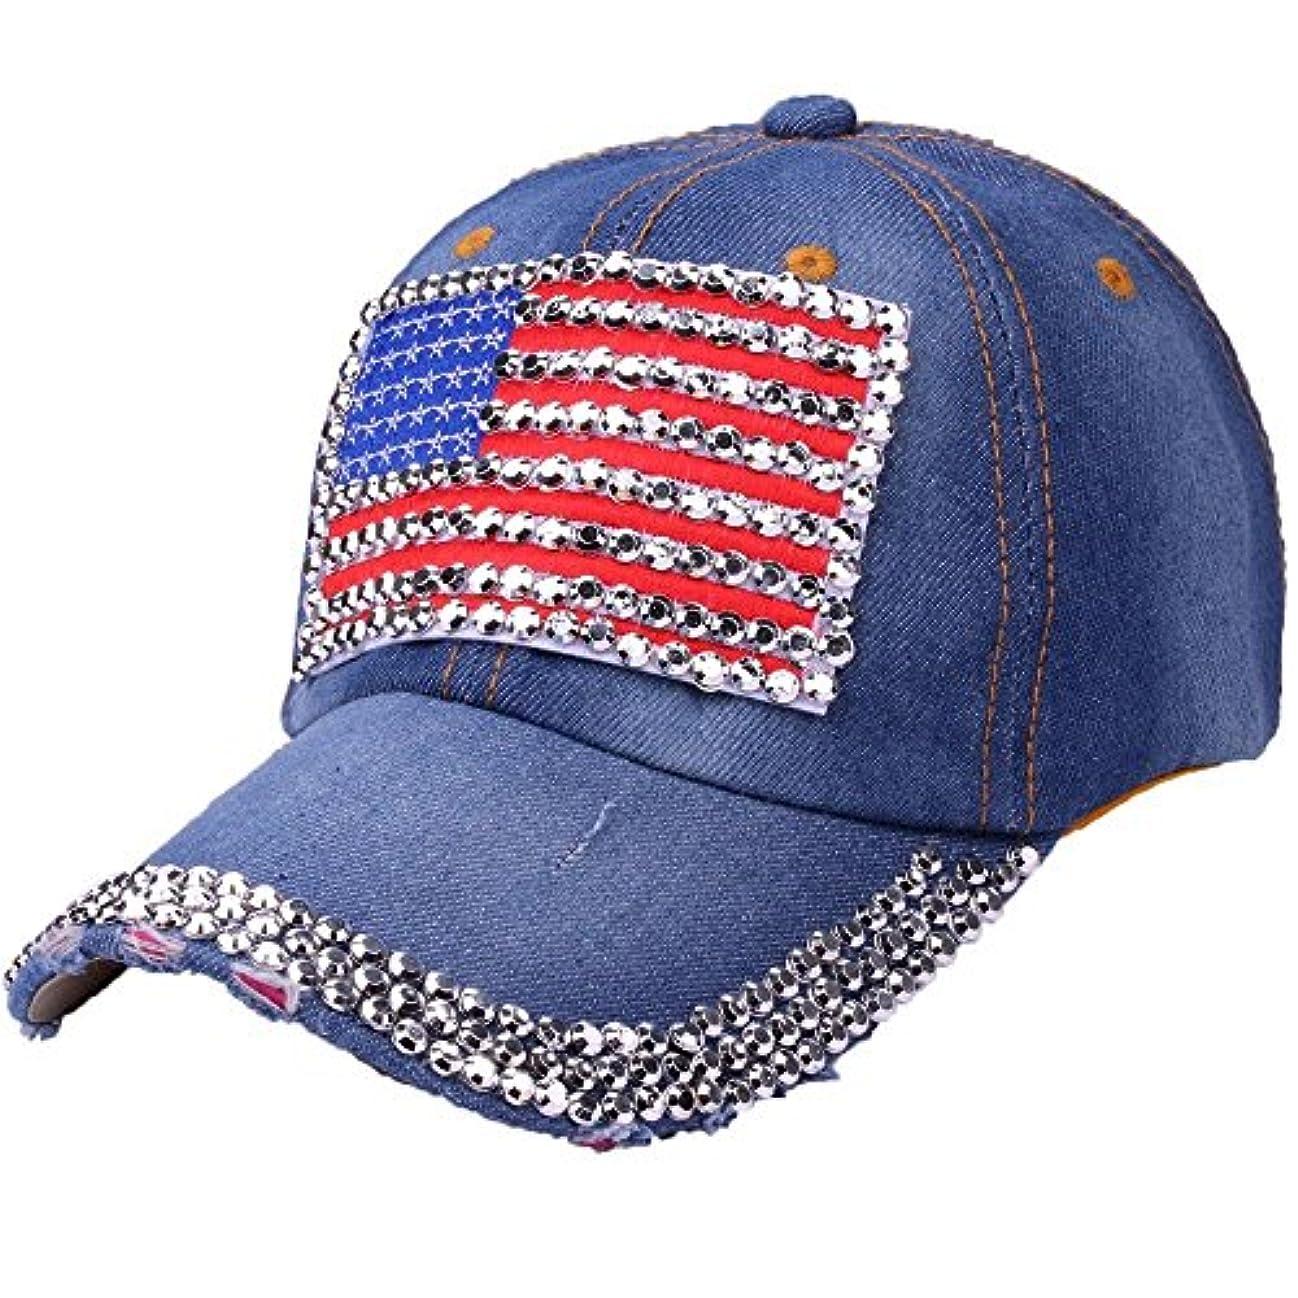 Racazing Cap カウボーイ 野球帽 ヒップホップ 通気性のある ラインストーン 帽子 夏 登山 アメリカの旗 可調整可能 棒球帽 男女兼用 UV 帽子 軽量 屋外 ジーンズ Unisex Cap (C)